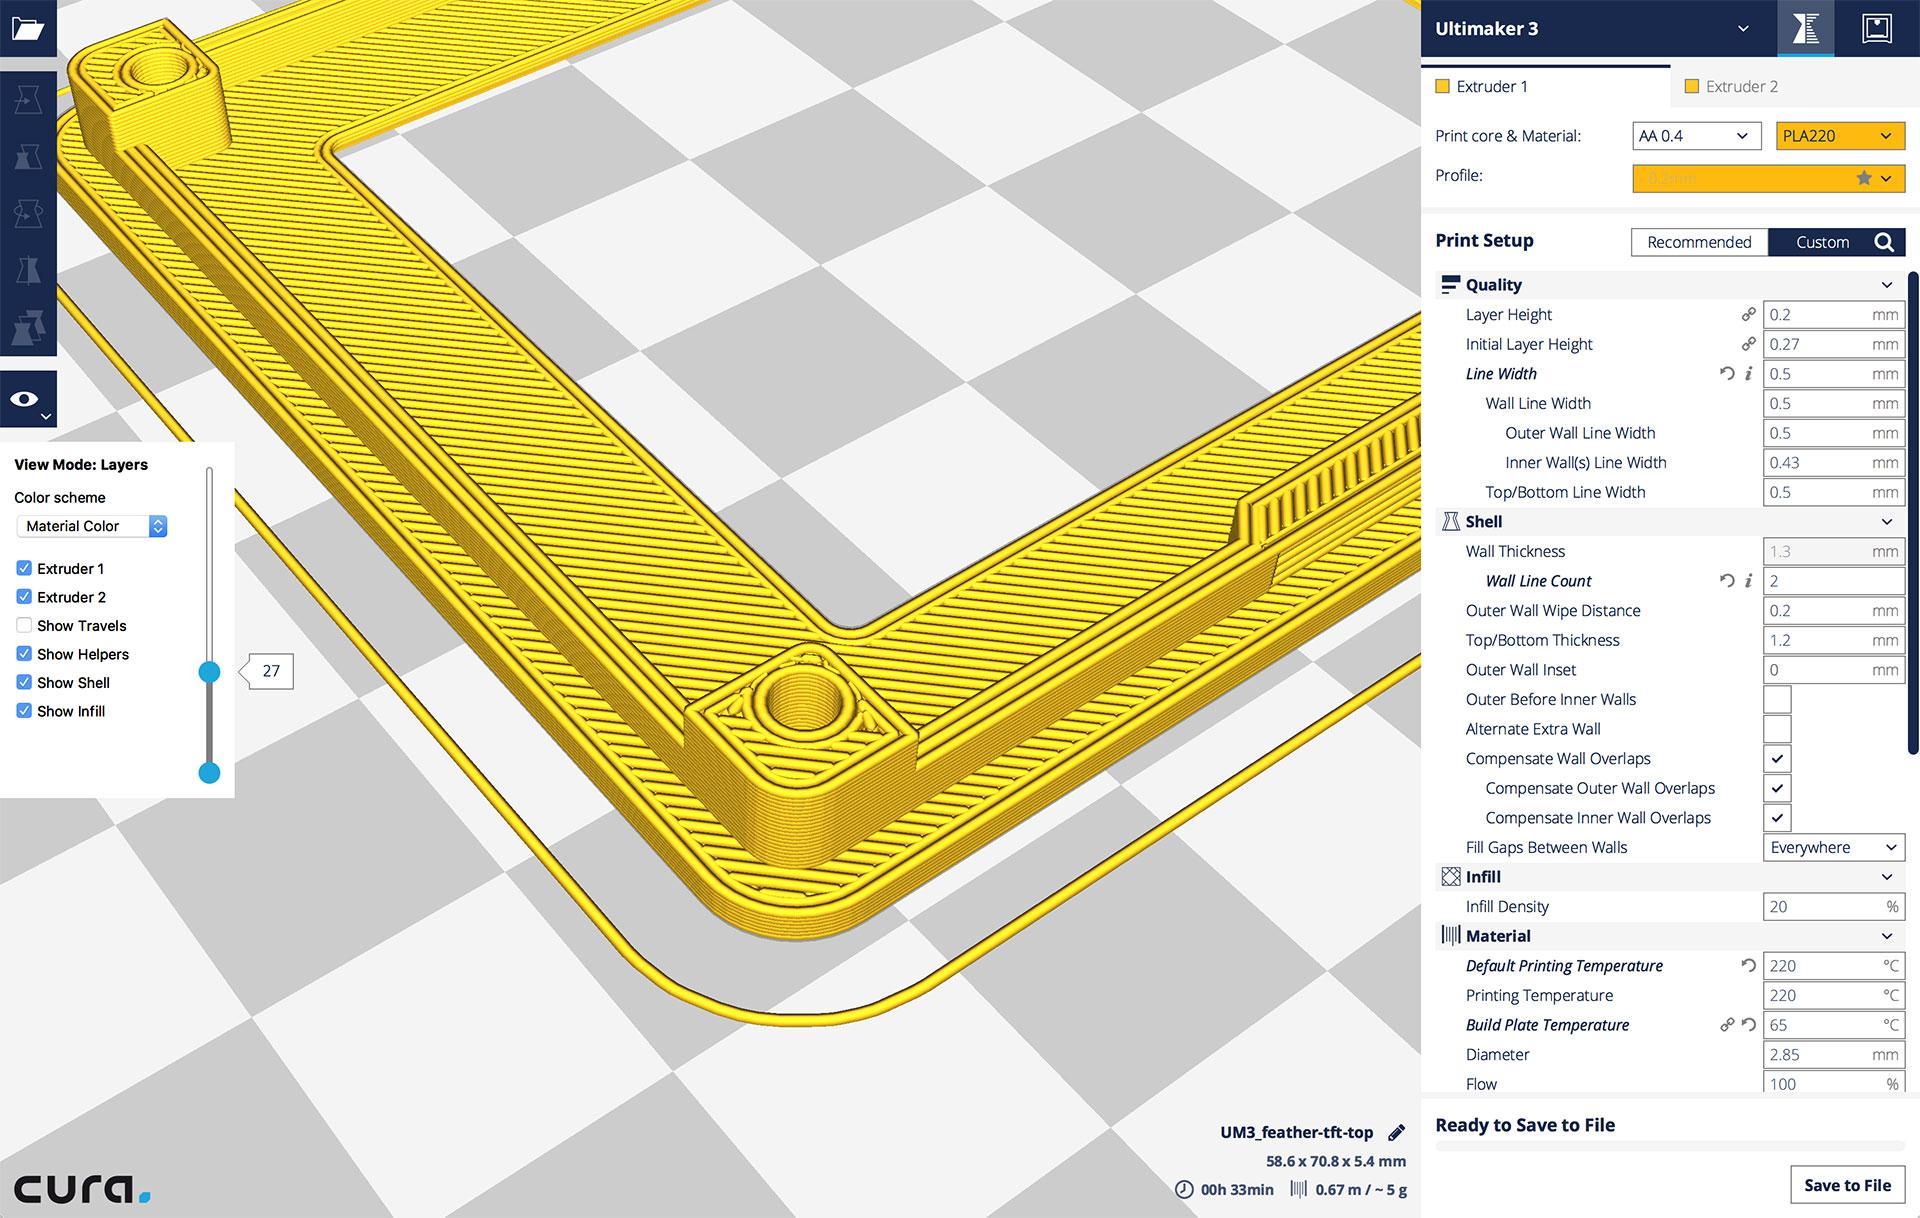 3d_printing_cura-2-5-xray.jpg